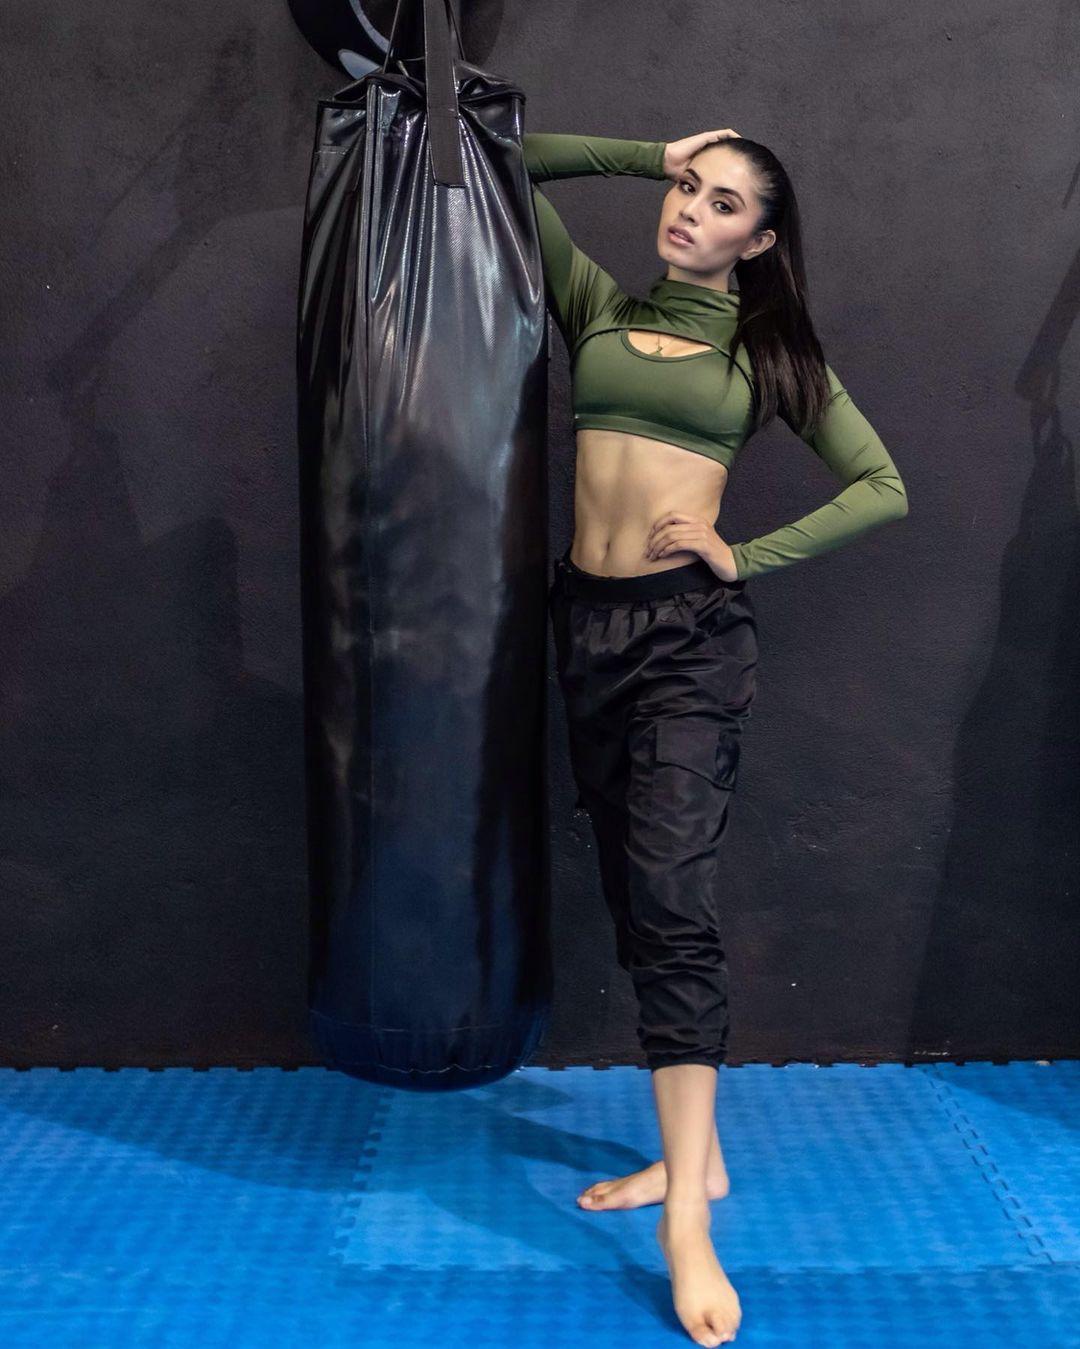 graciela ballesteros, miss earth mexico 2020/top 10 de miss polo international 2019. - Página 3 Gracie40